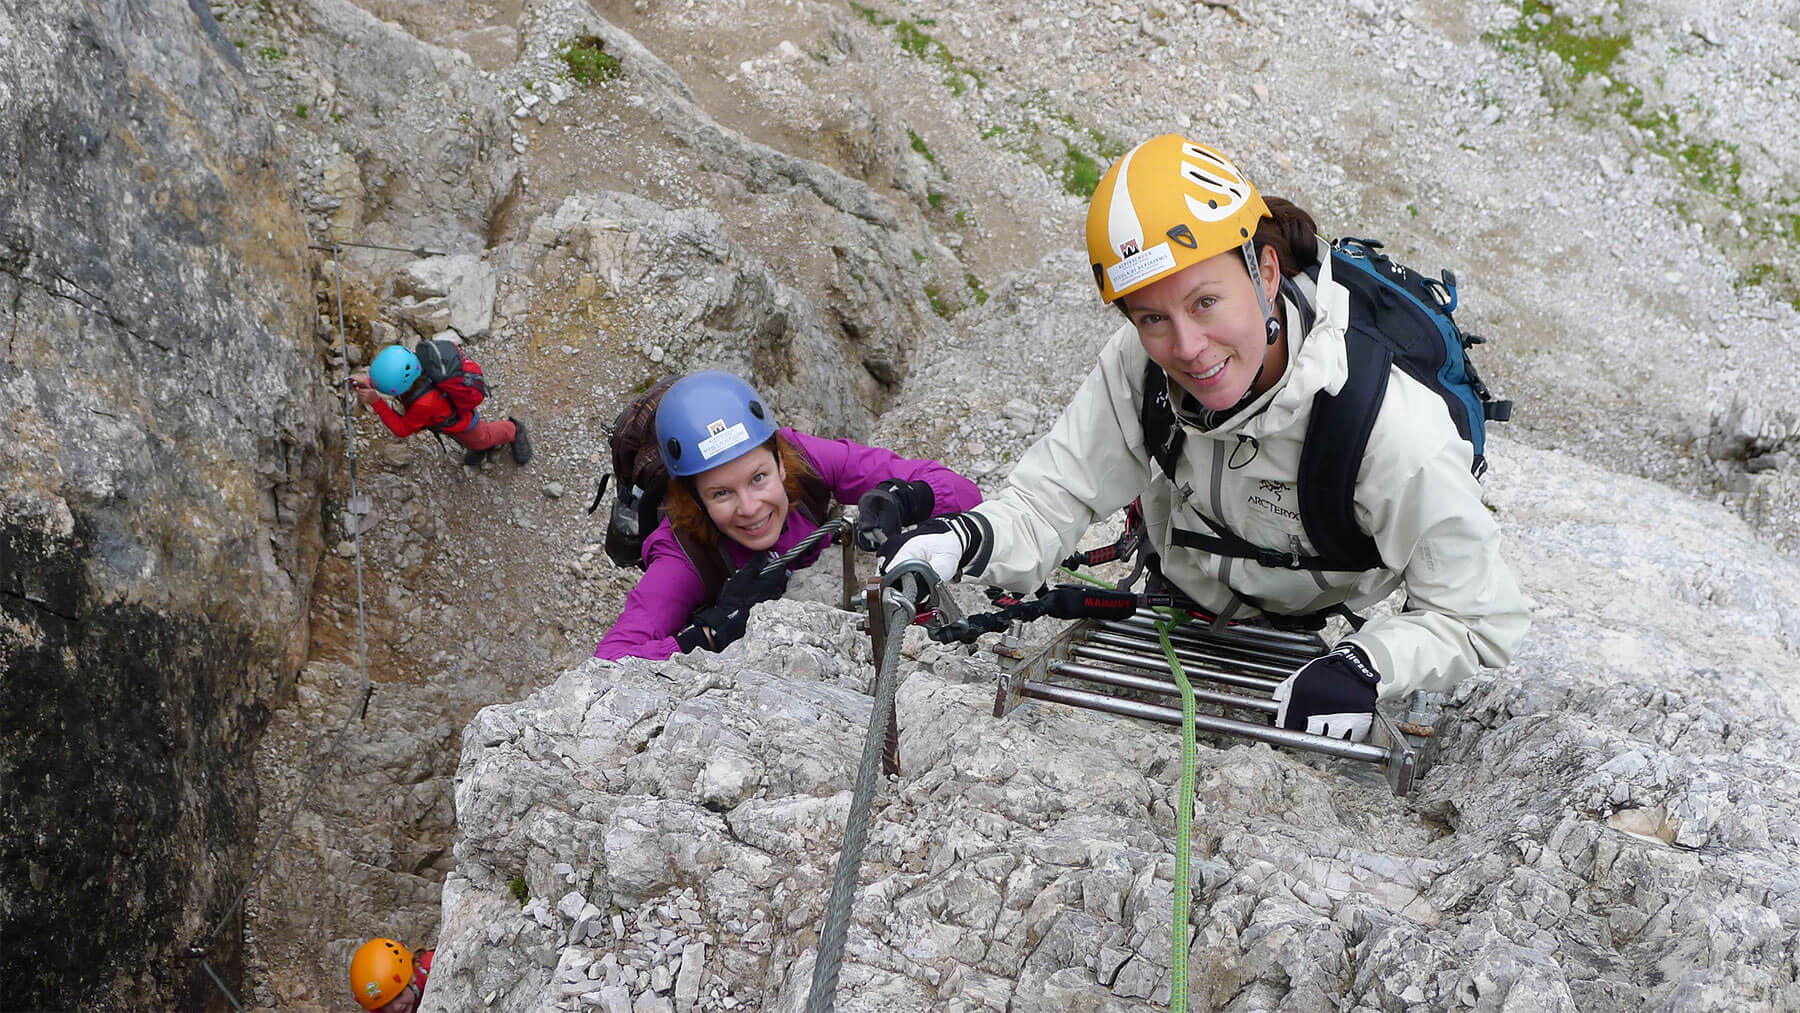 Klettersteig Drei Zinnen : Klettersteige in den sextner dolomiten südtirol berghotel